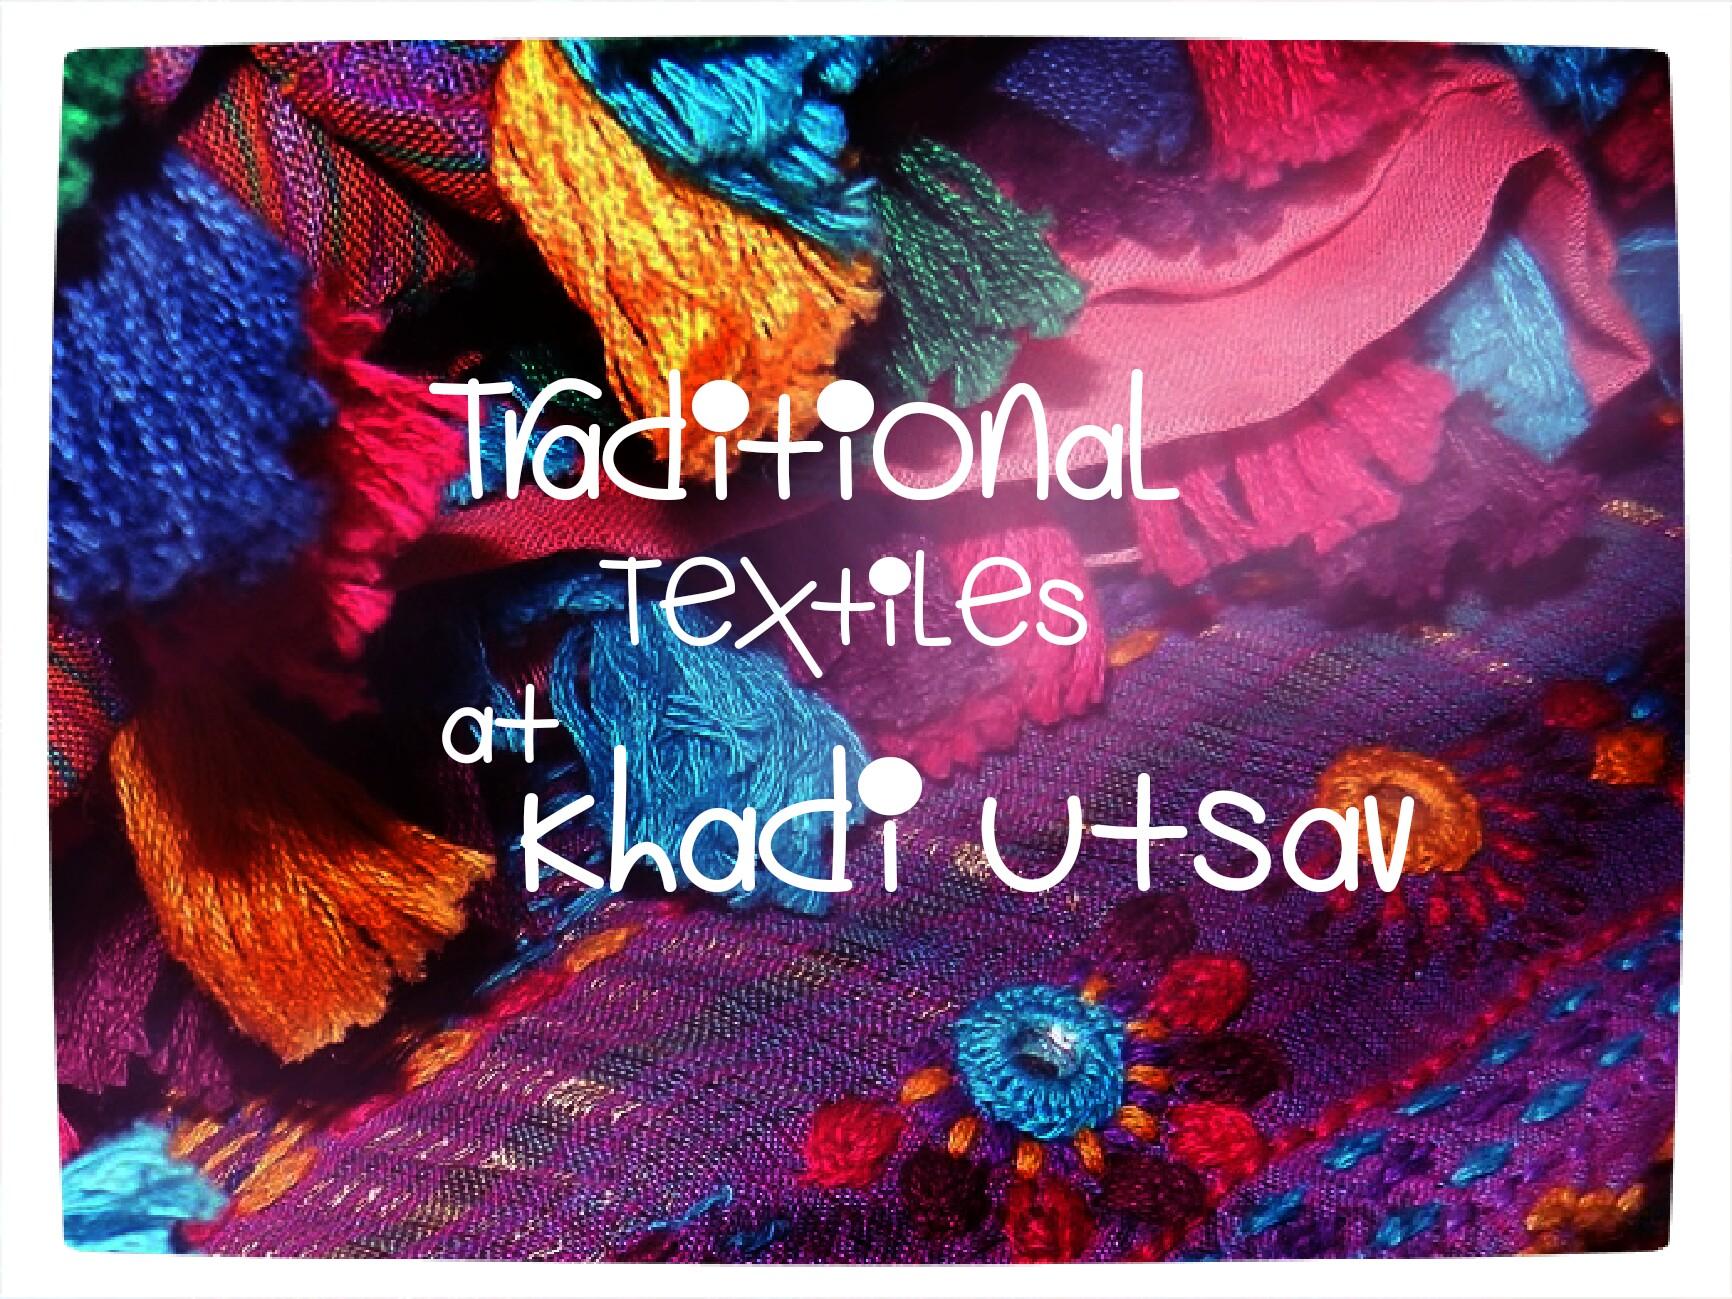 Traditional Textiles at Khadi Utsav